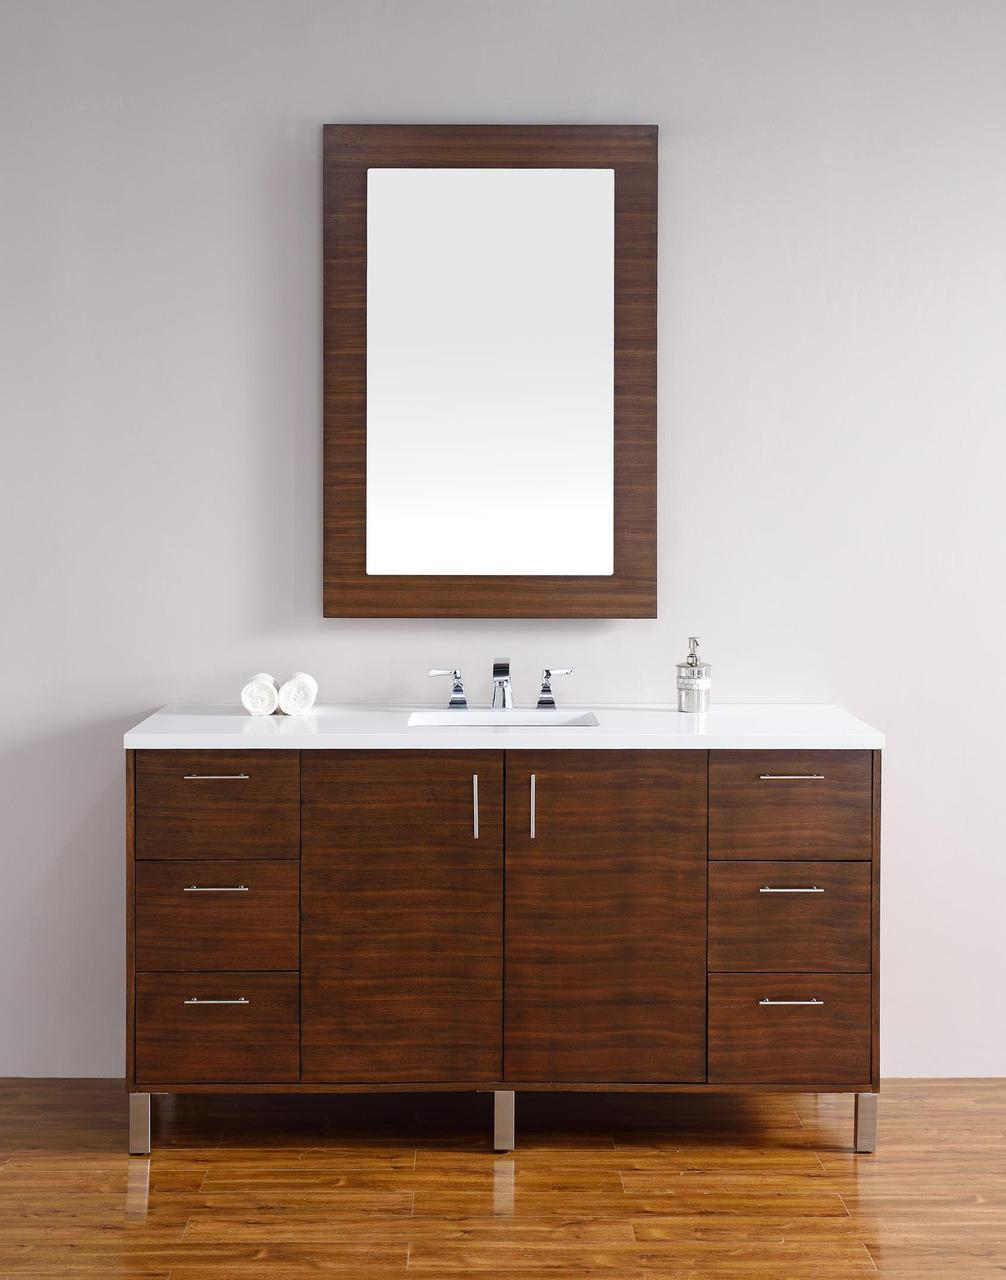 Abstron 60 Inch Walnut Finish Single Sink Modern Bathroom Vanity Optional Countertop